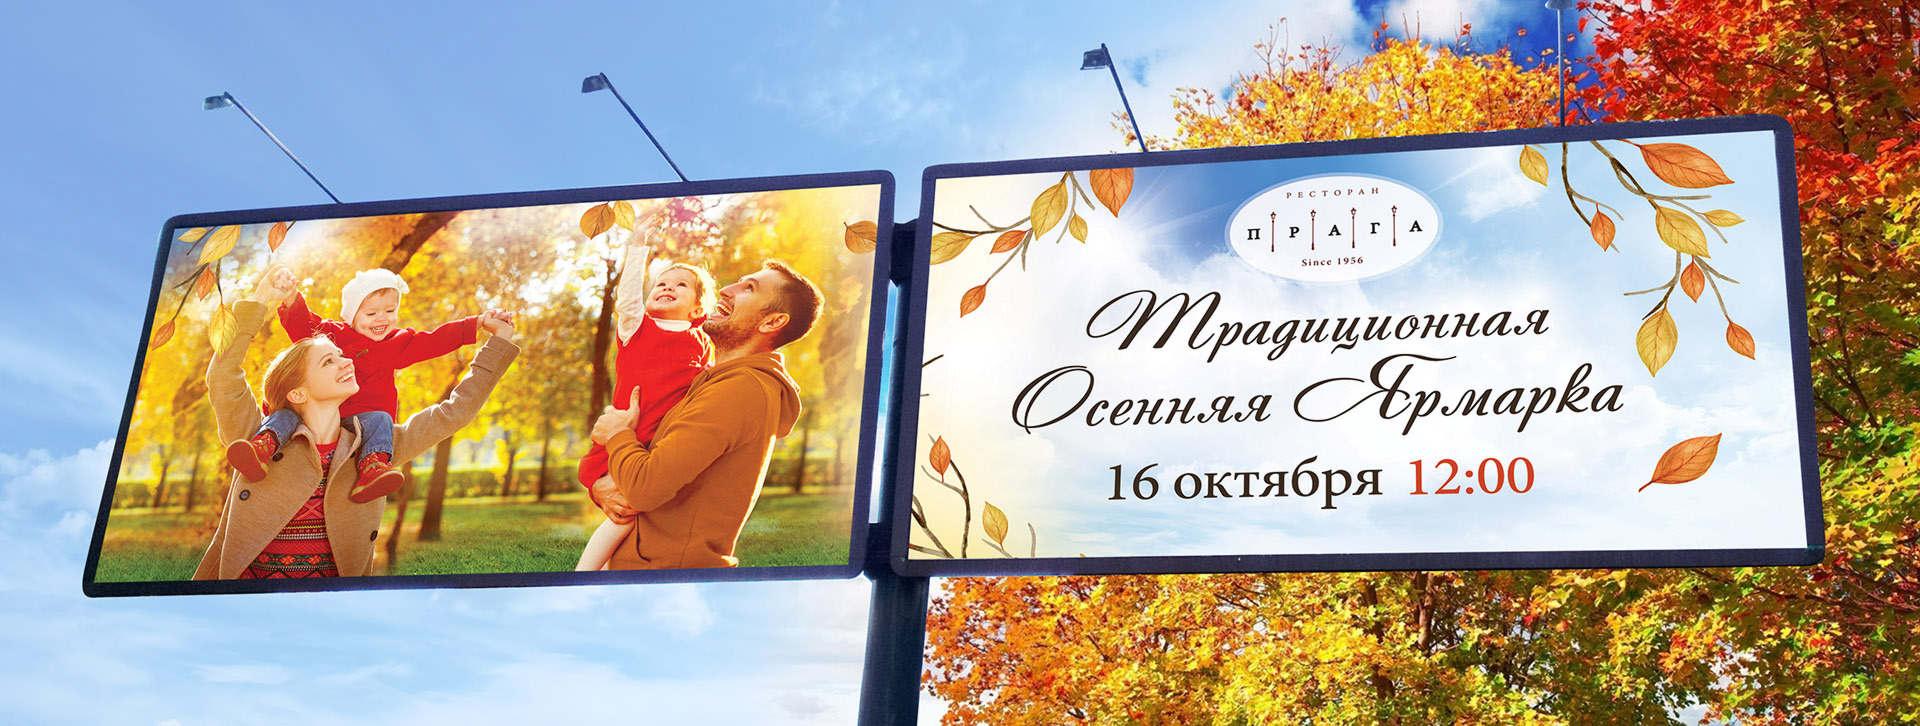 Билборд ресторана Прага Традиционная осенняя ярмарка